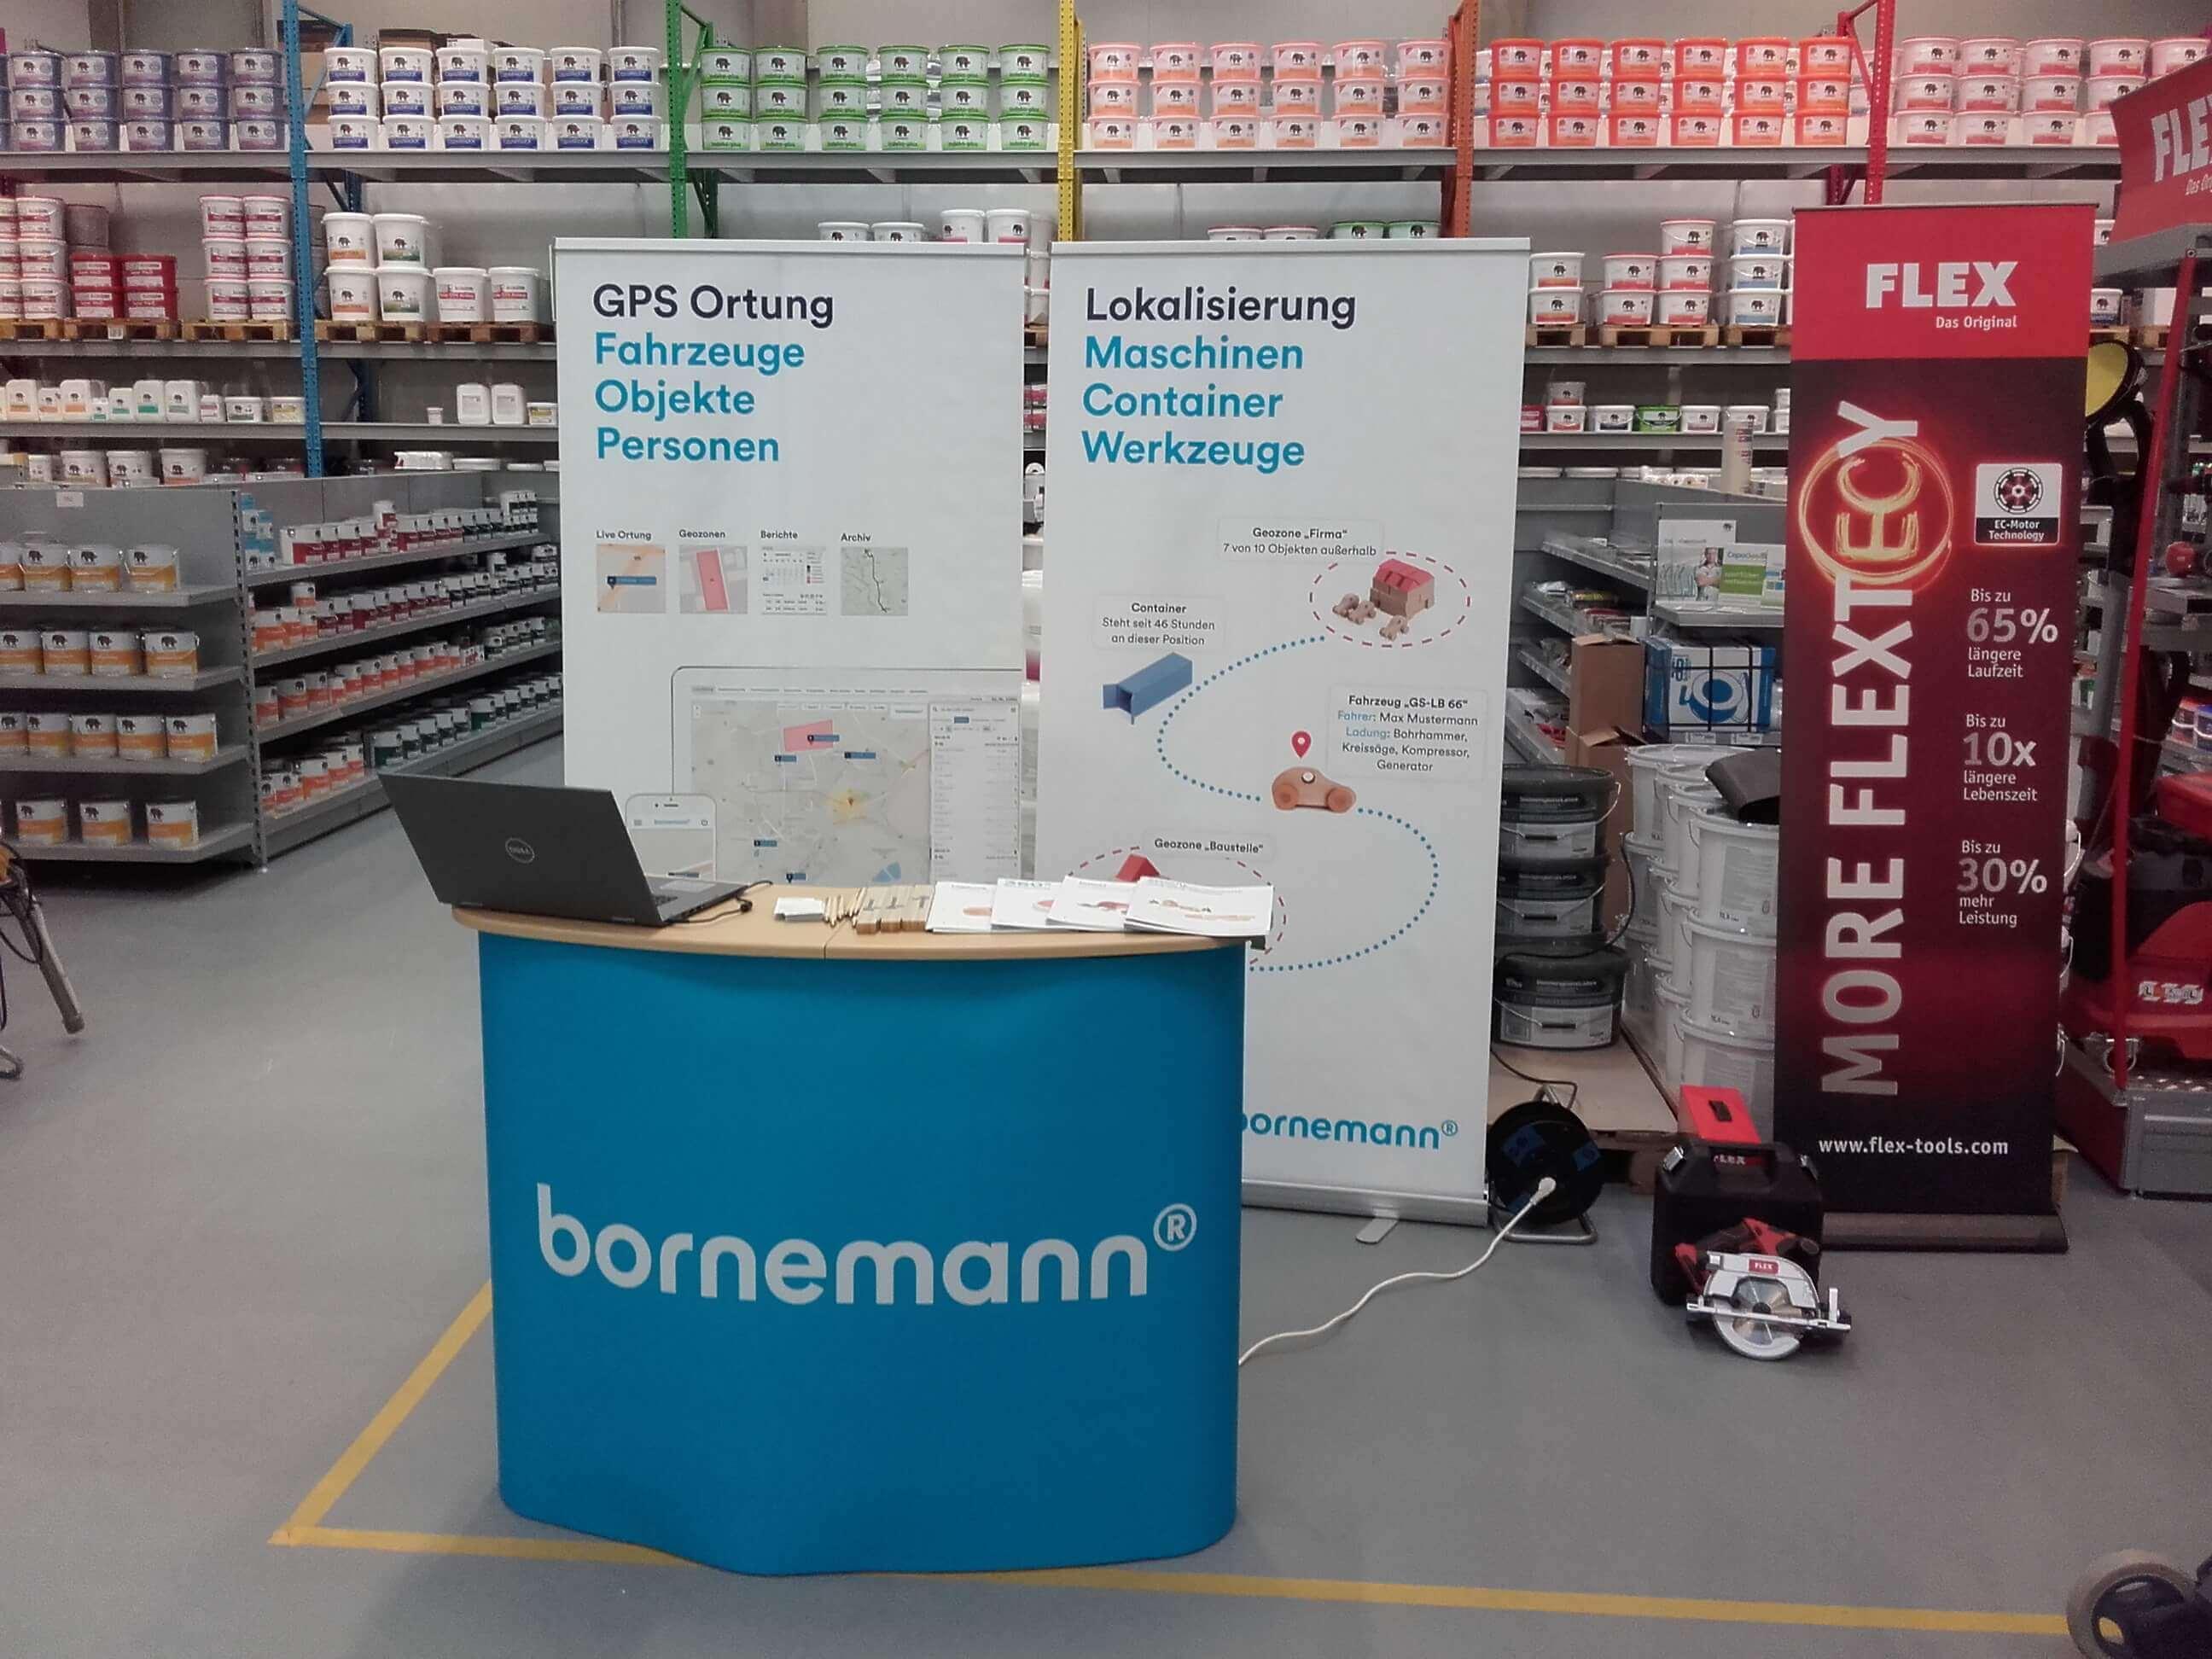 Bbornemann Messe Knittel Berlin